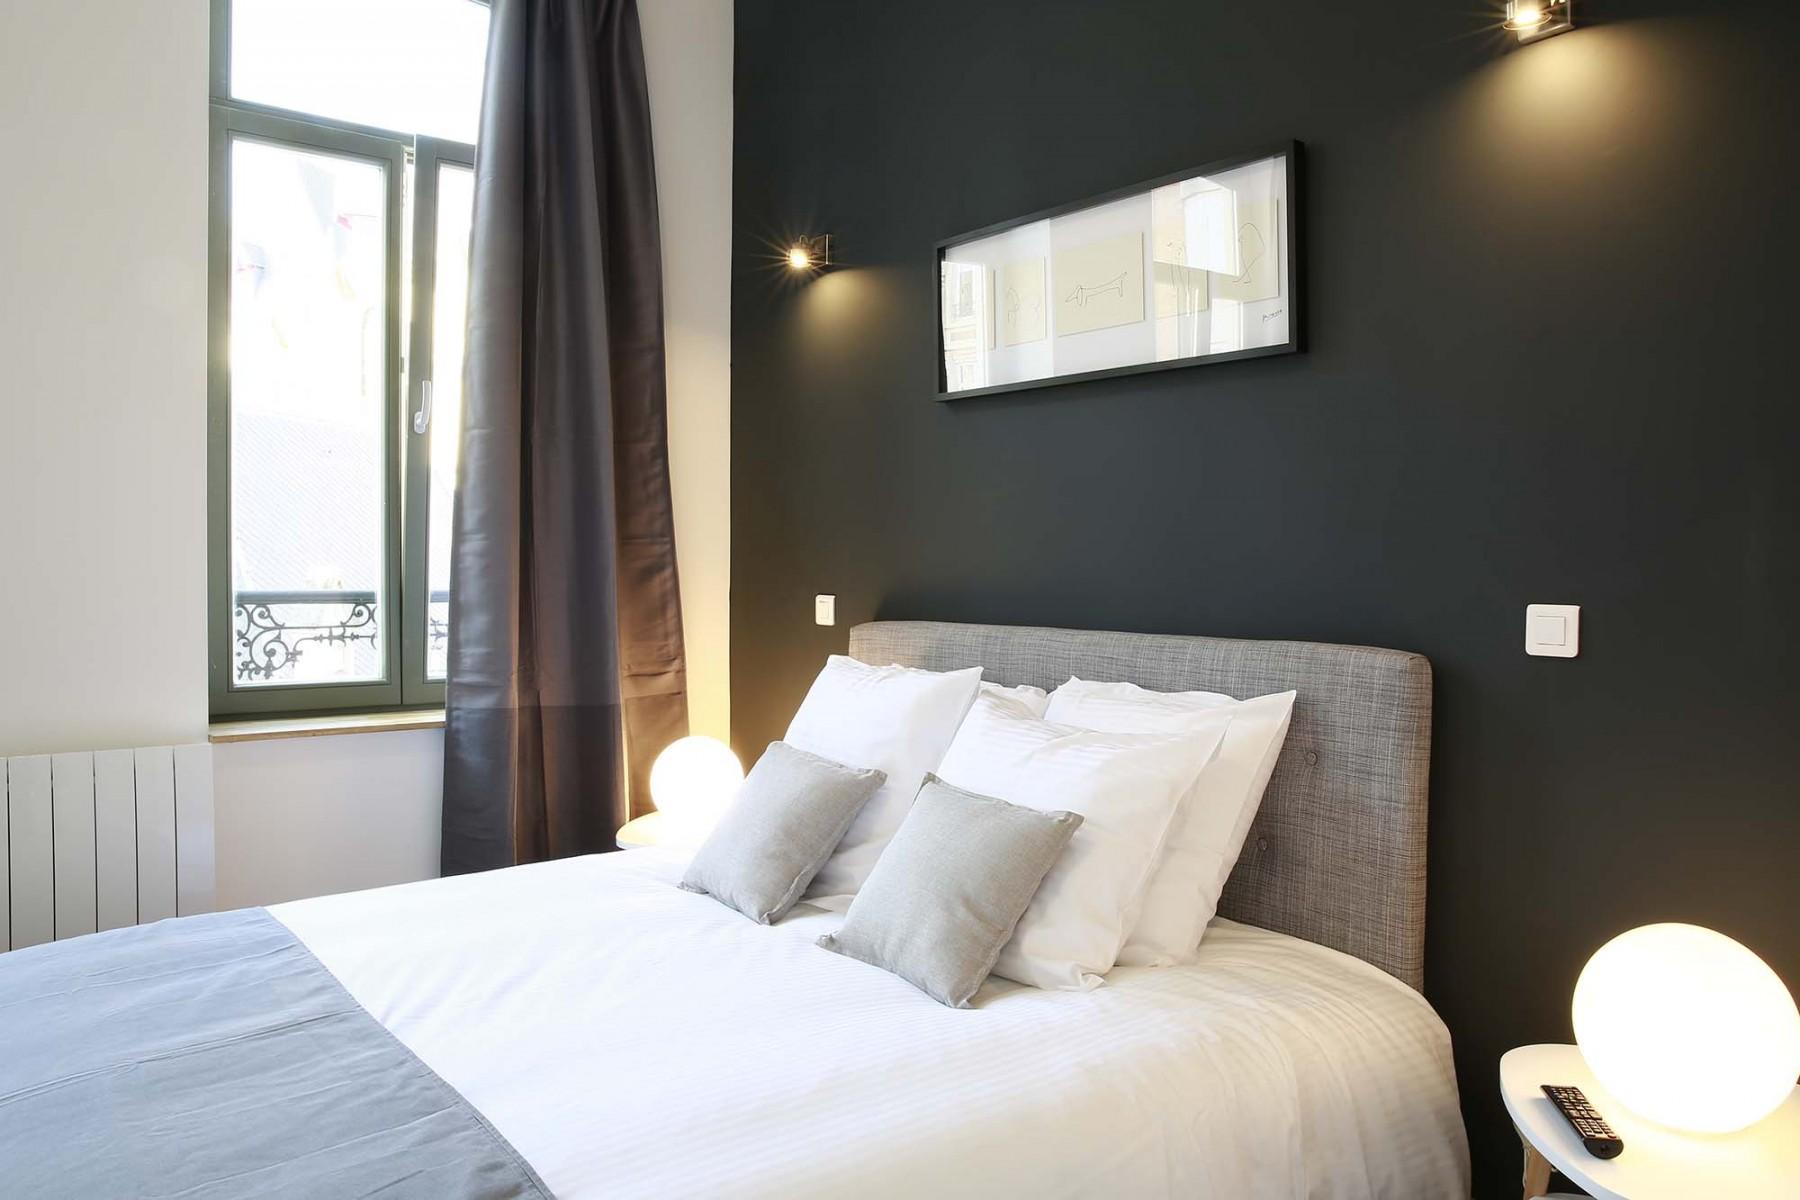 Appartements a Lille - Le Carlton Appartement 2 chambres